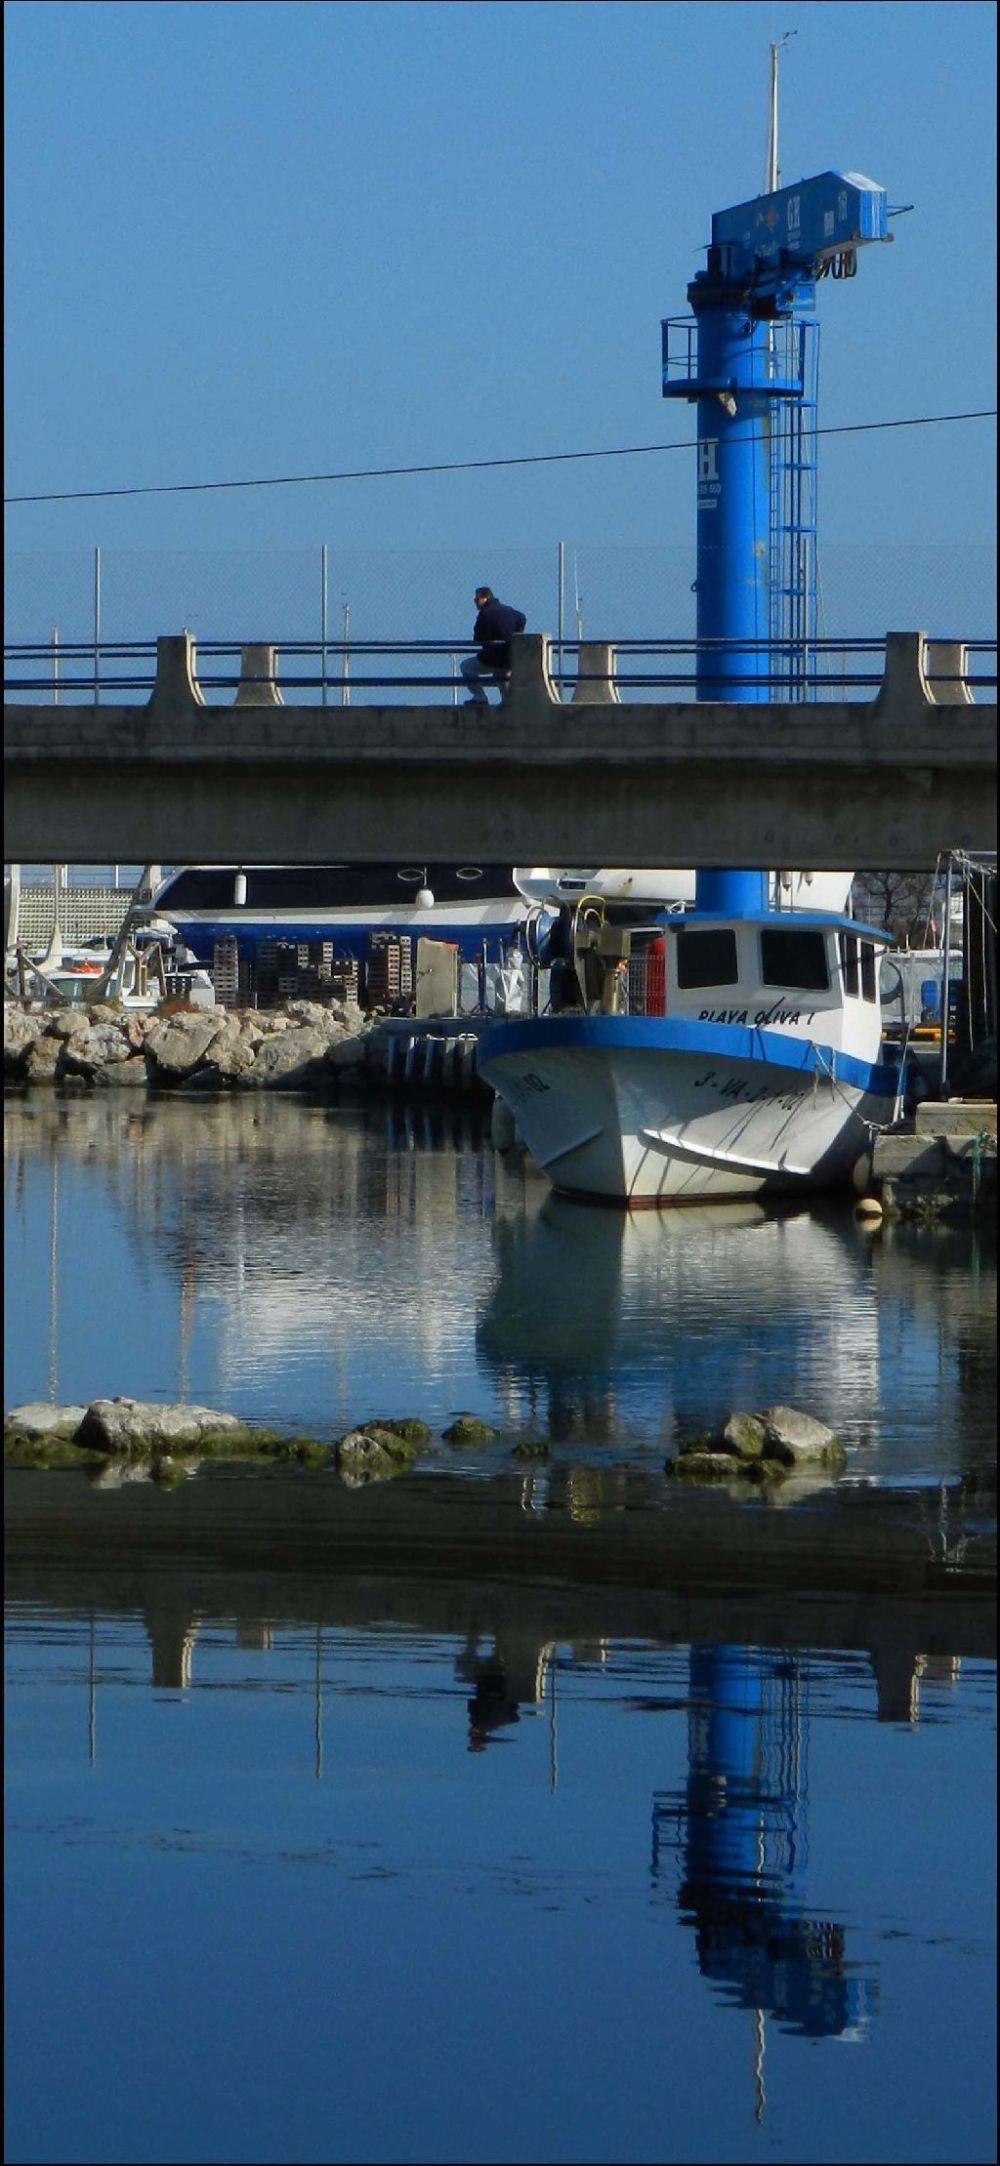 Tiny Fishing Port in Oliva